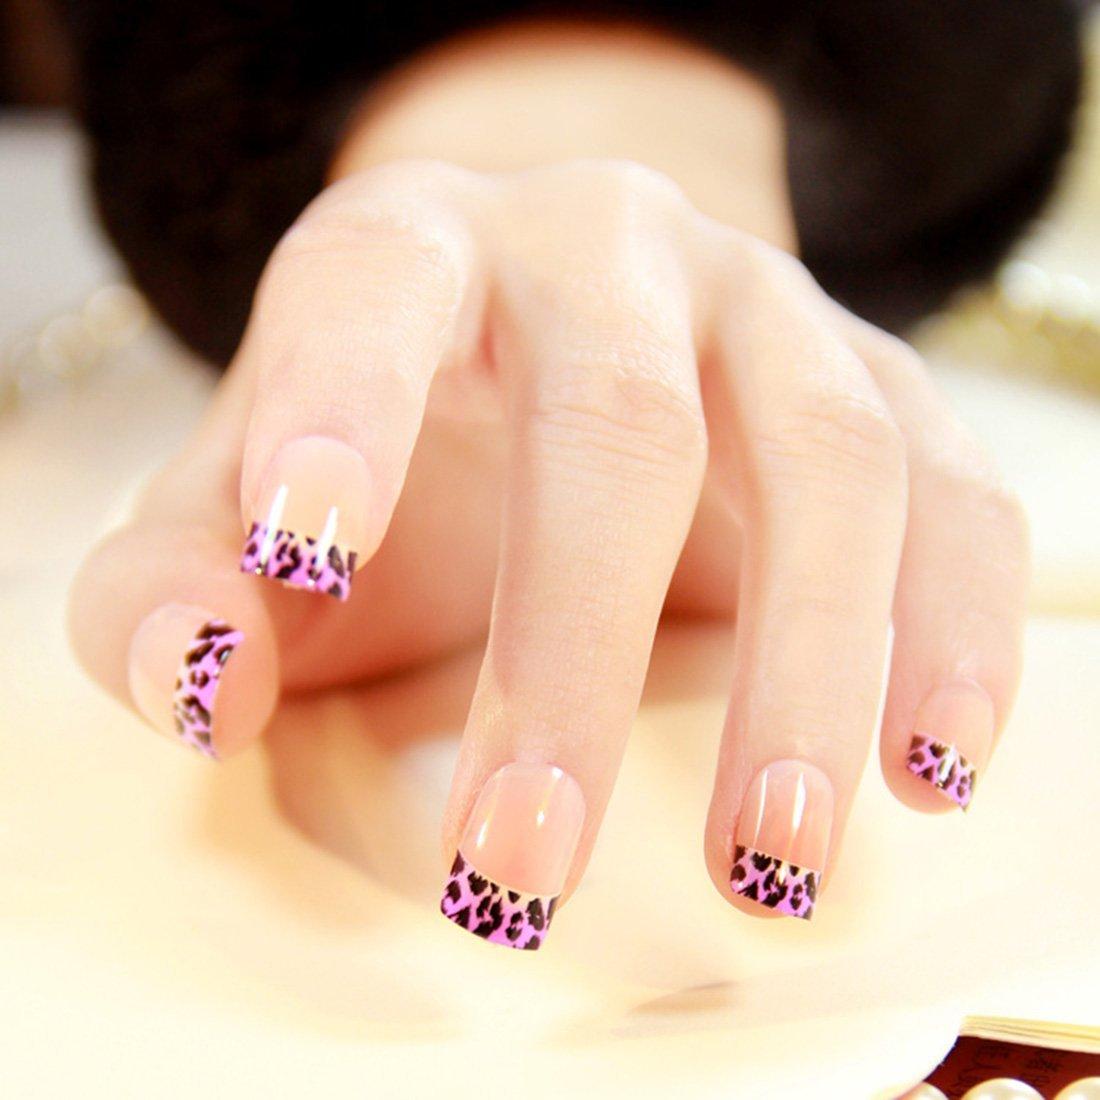 Cheap Nail Art On Purple Nails Find Nail Art On Purple Nails Deals